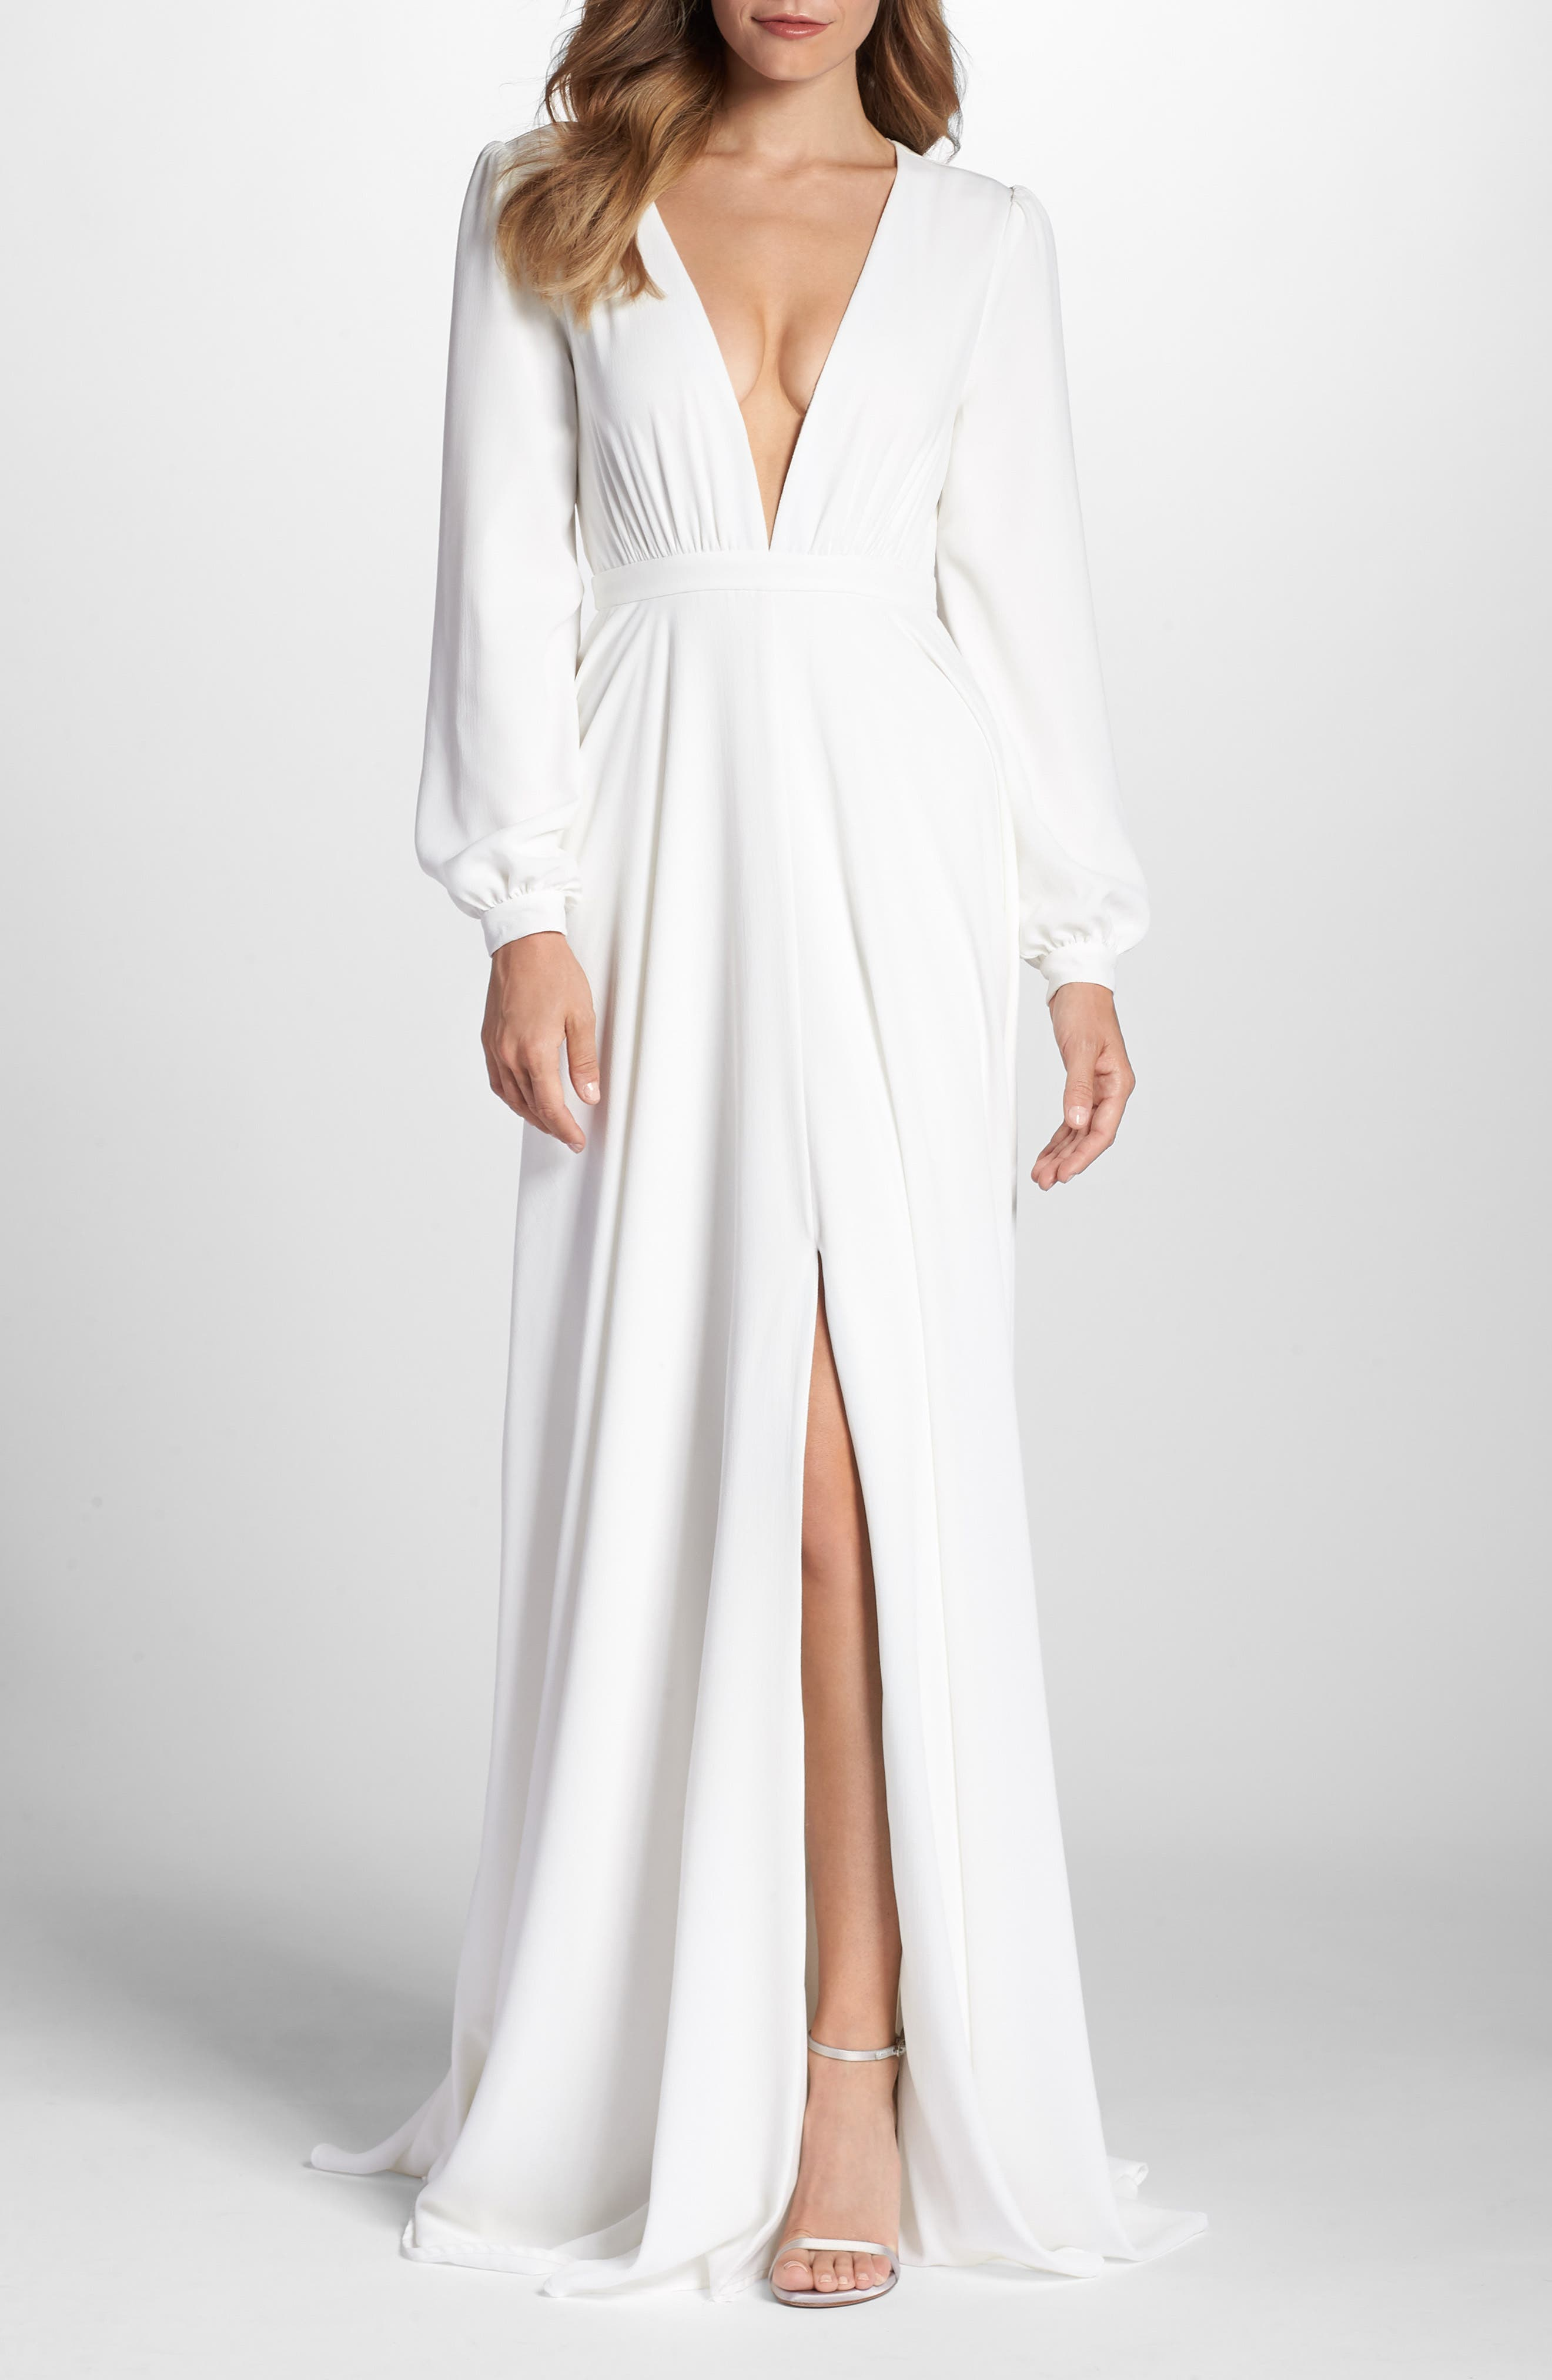 Floyd V-Neck Long Sleeve Gown,                             Main thumbnail 1, color,                             White